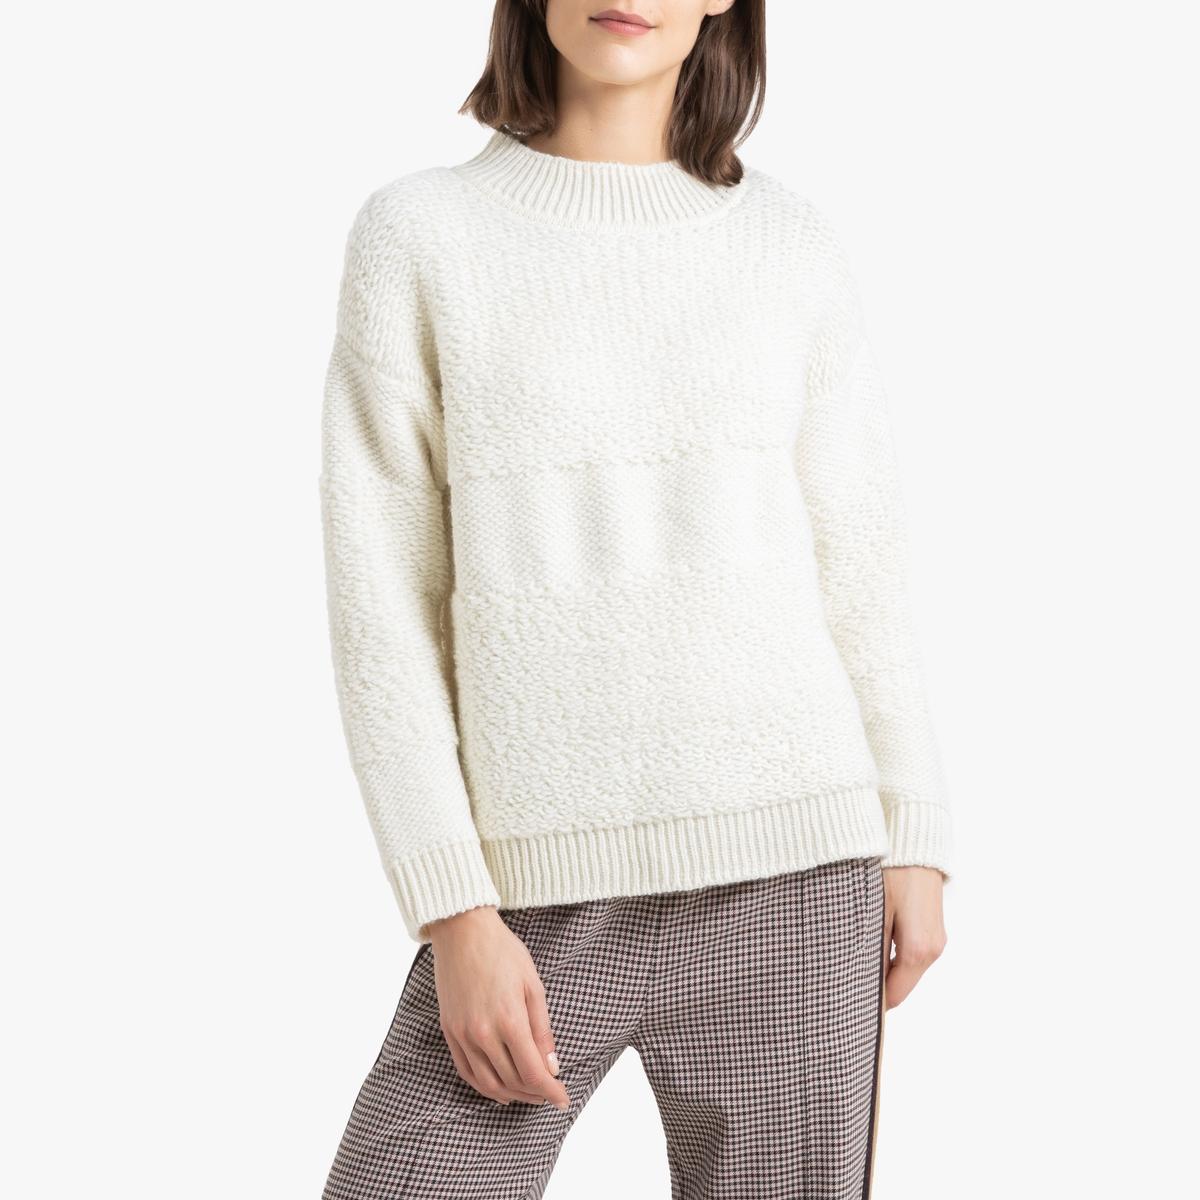 Пуловер La Redoute С круглым вырезом из тонкого трикотажа PAYTON 0(XS) бежевый пуловер la redoute с круглым вырезом из тонкого трикотажа m бежевый